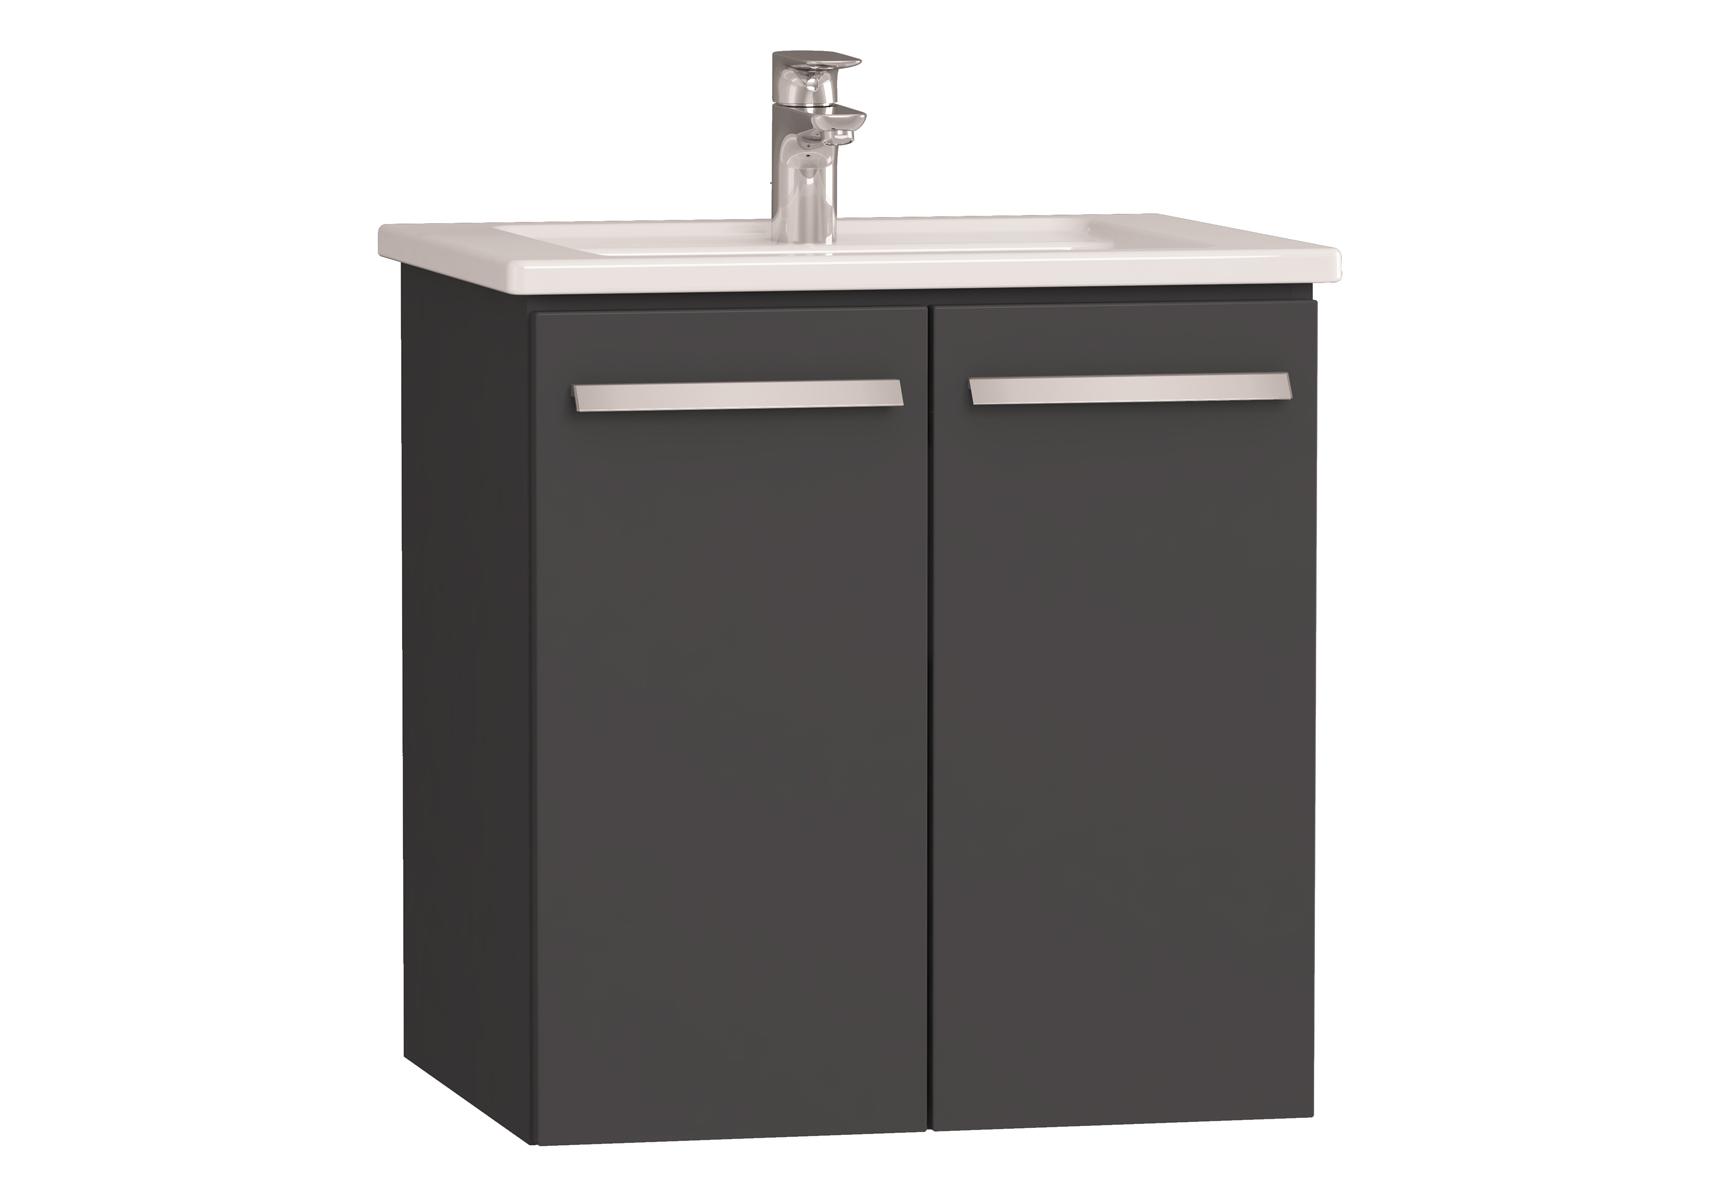 Integra meuble avec plan céramique avec portes, 60 cm, anthraciteacite haute brillance